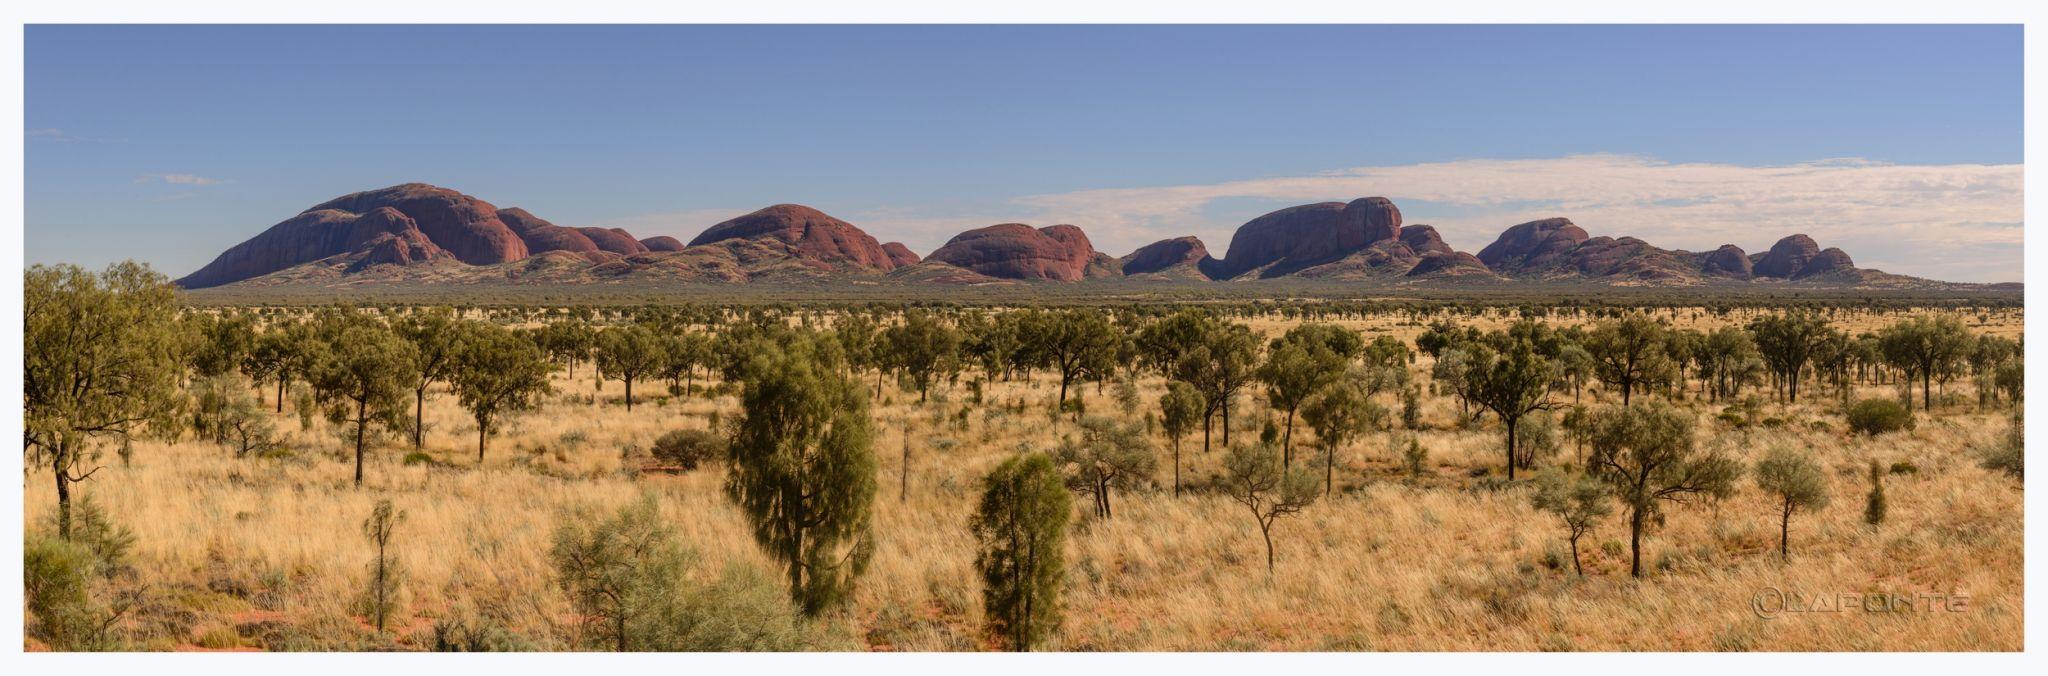 Kata Tjuta (aka The Olgas) - Northern Territory, Australia, Australia